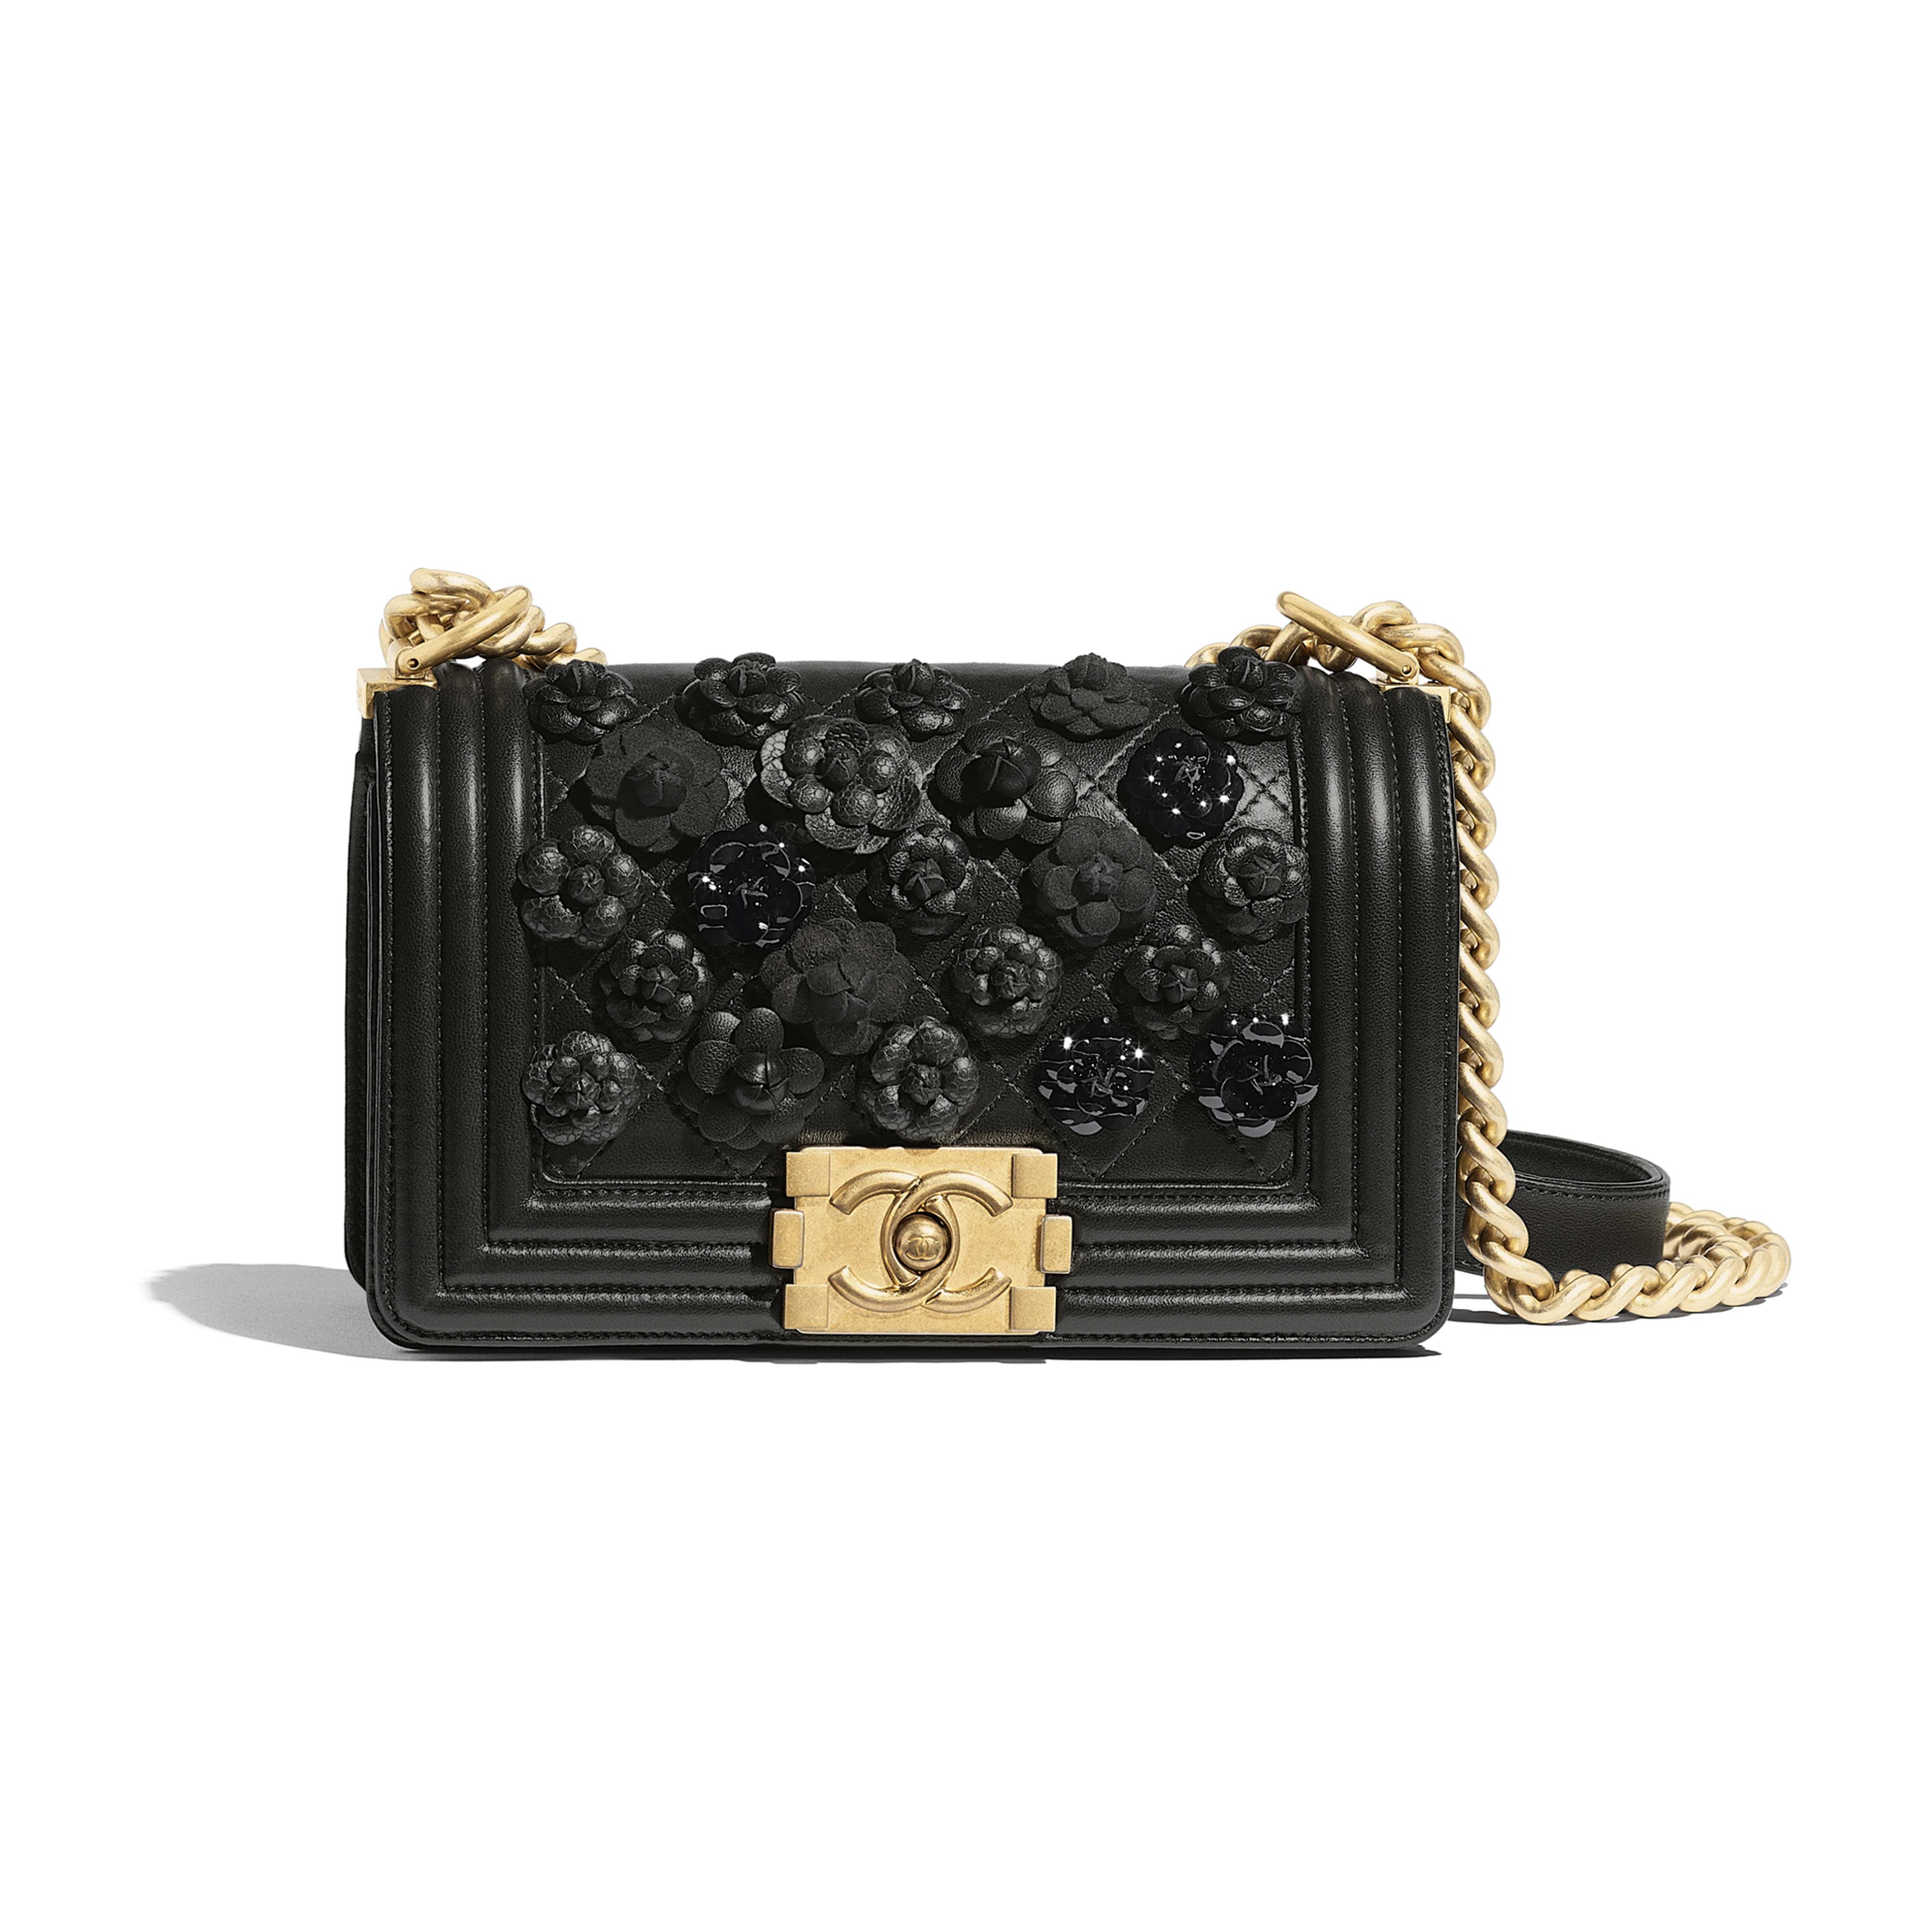 452e55eb4e56 Small BOY CHANEL Handbag - Black - Embroidered Lambskin   Gold-Tone Metal -  Default ...